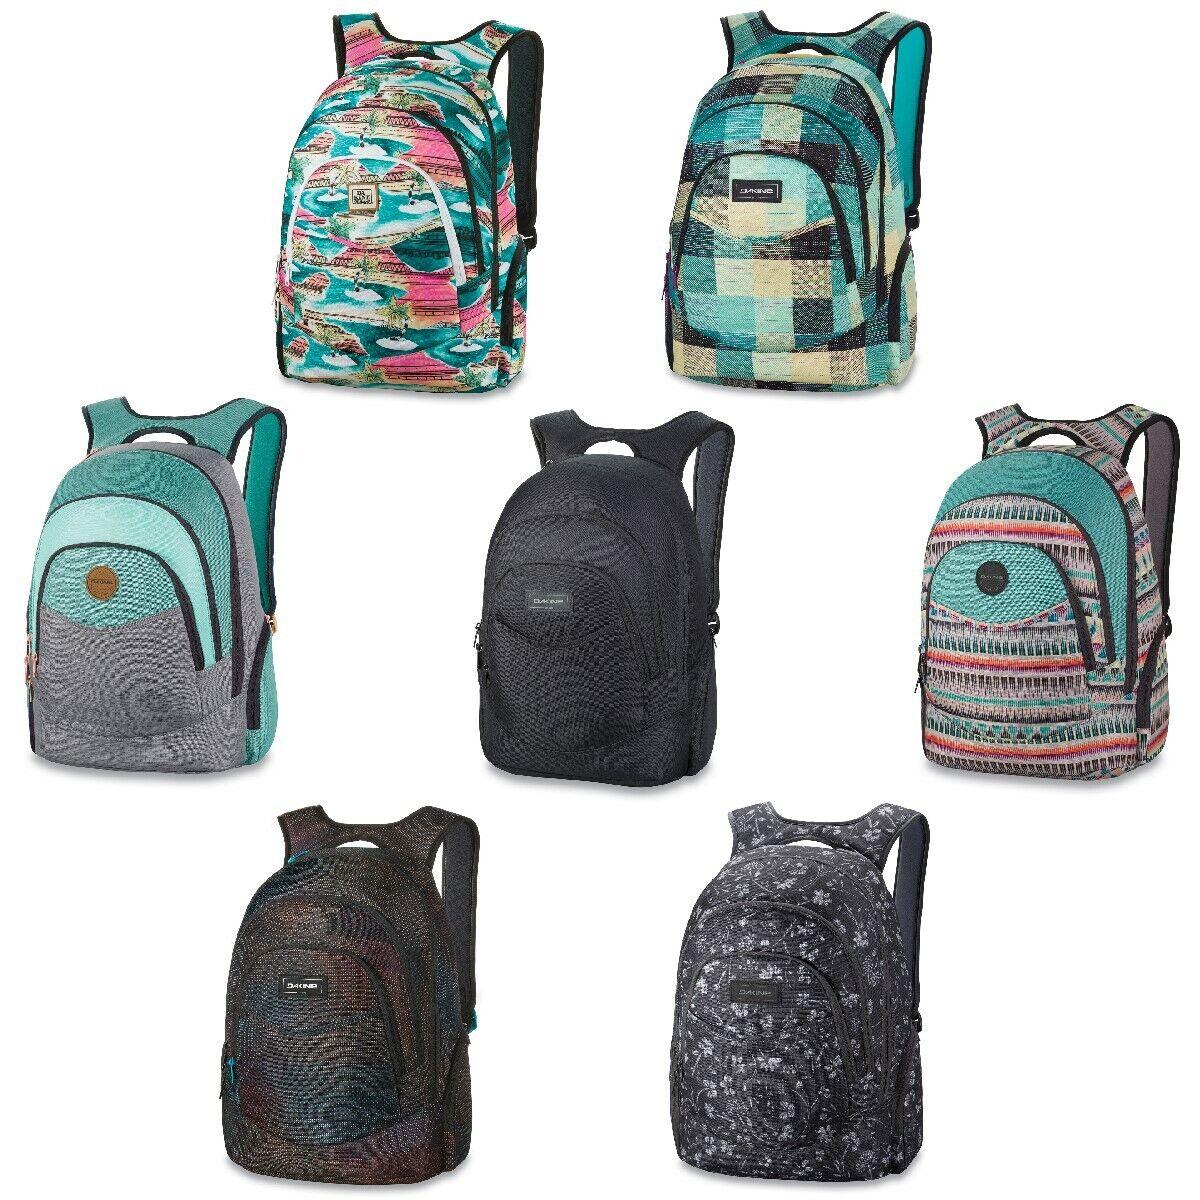 Dakine Backpack Girls Prom Pack 25 Liter Laptop Compartuominit School Rucksack